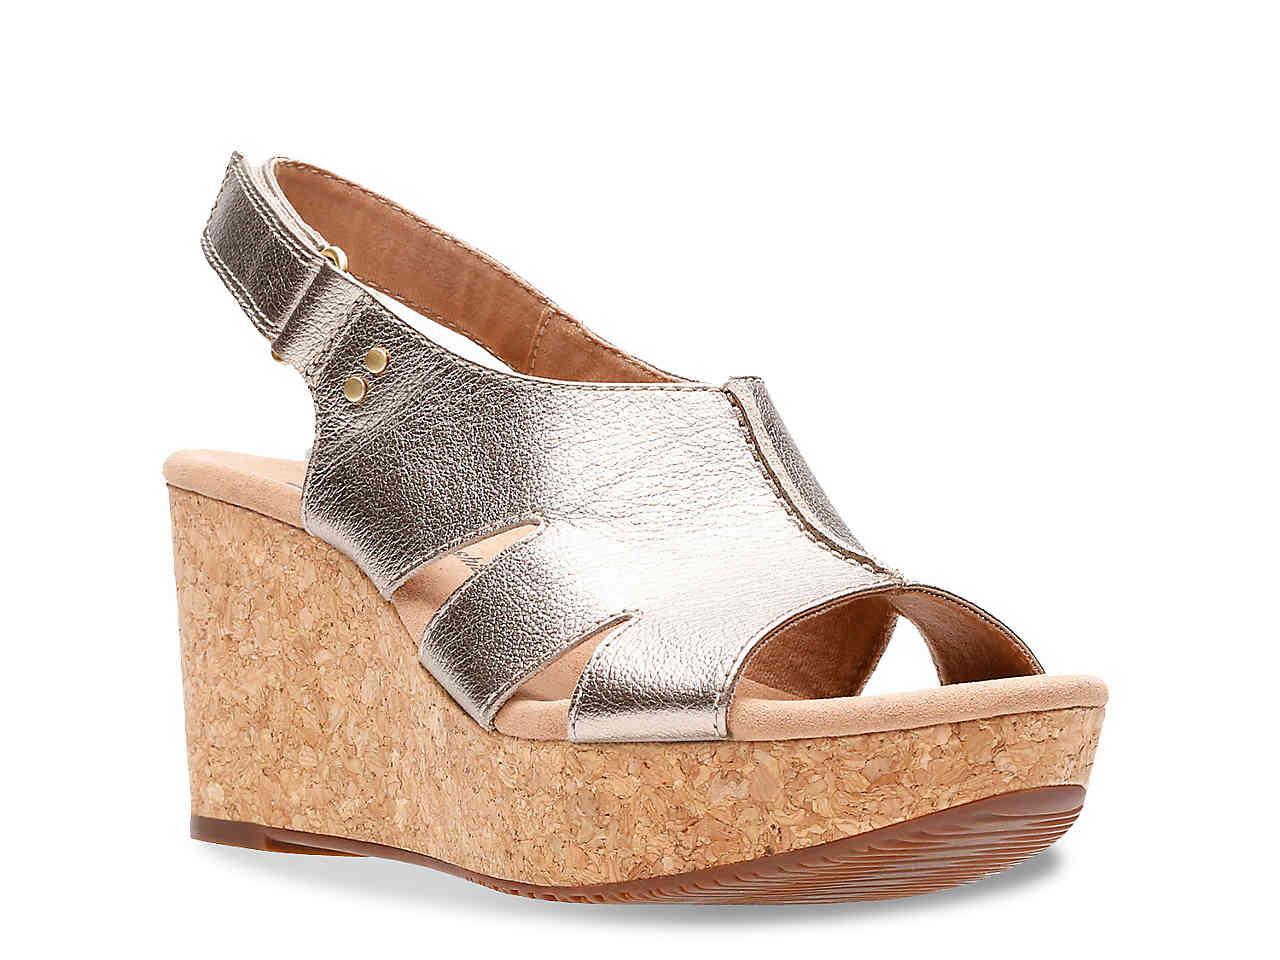 4b23285af10 Lyst - Clarks Annadel Bari Wedge Sandal in Metallic